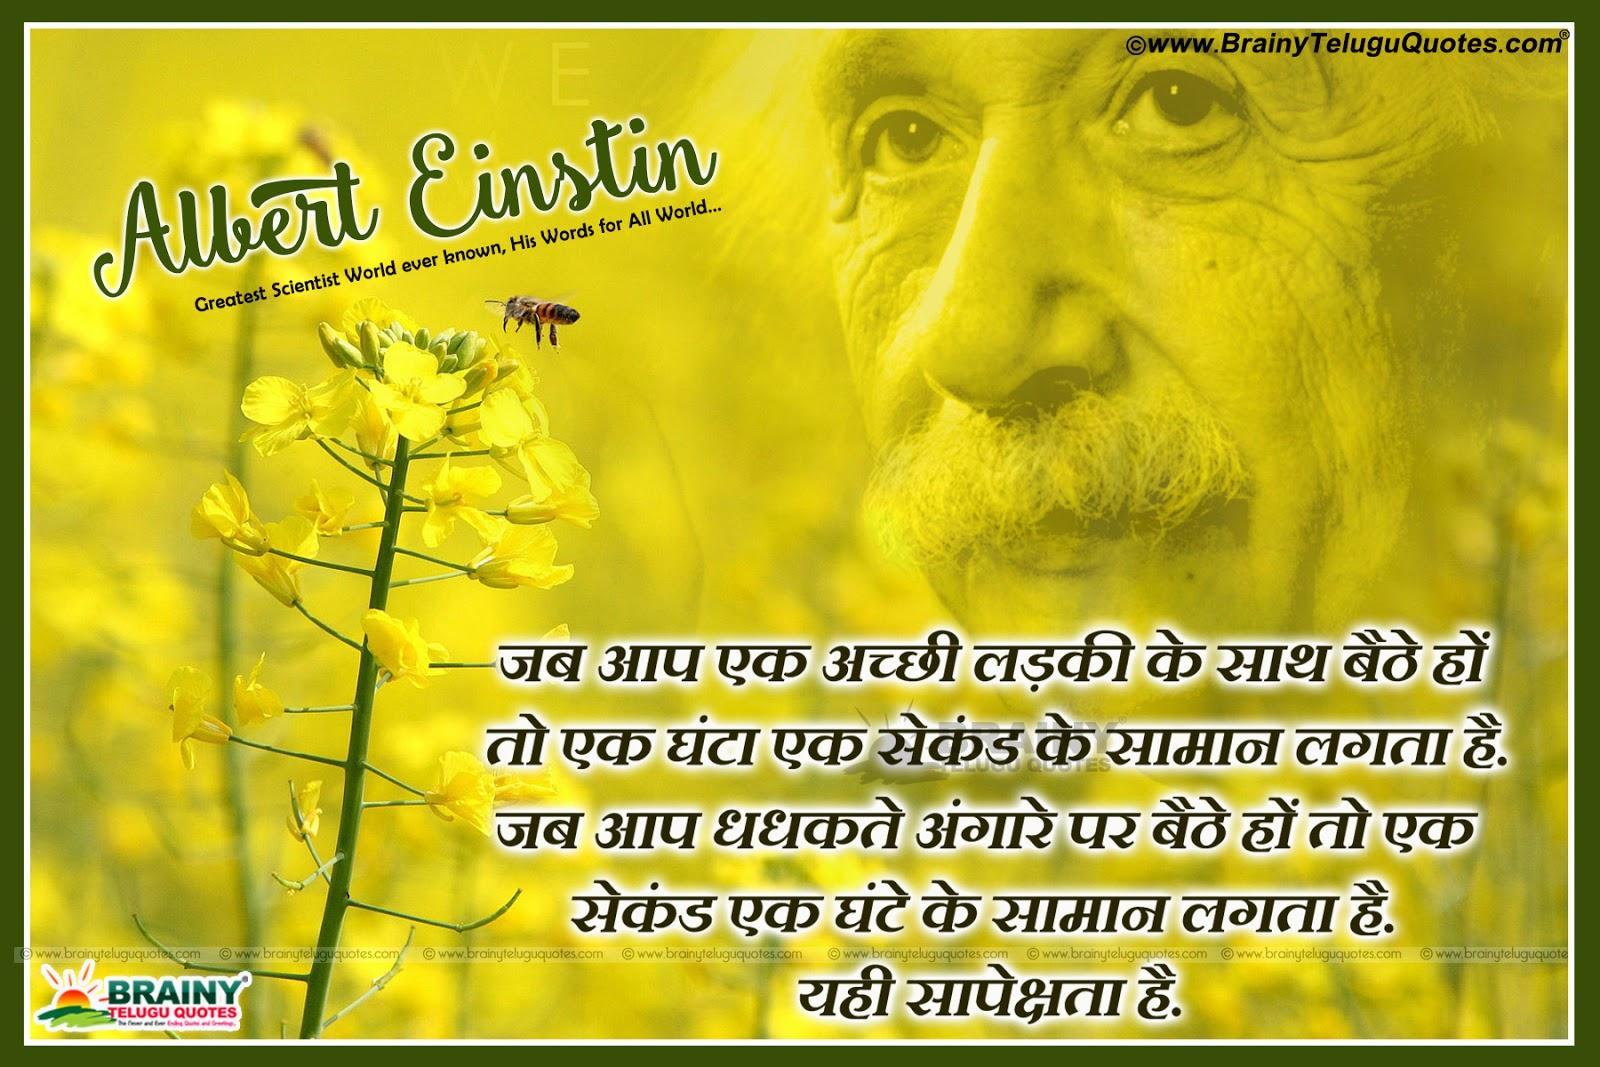 Albert Einstin Quotes In Hindi Hindi Latest Anmol Vachan